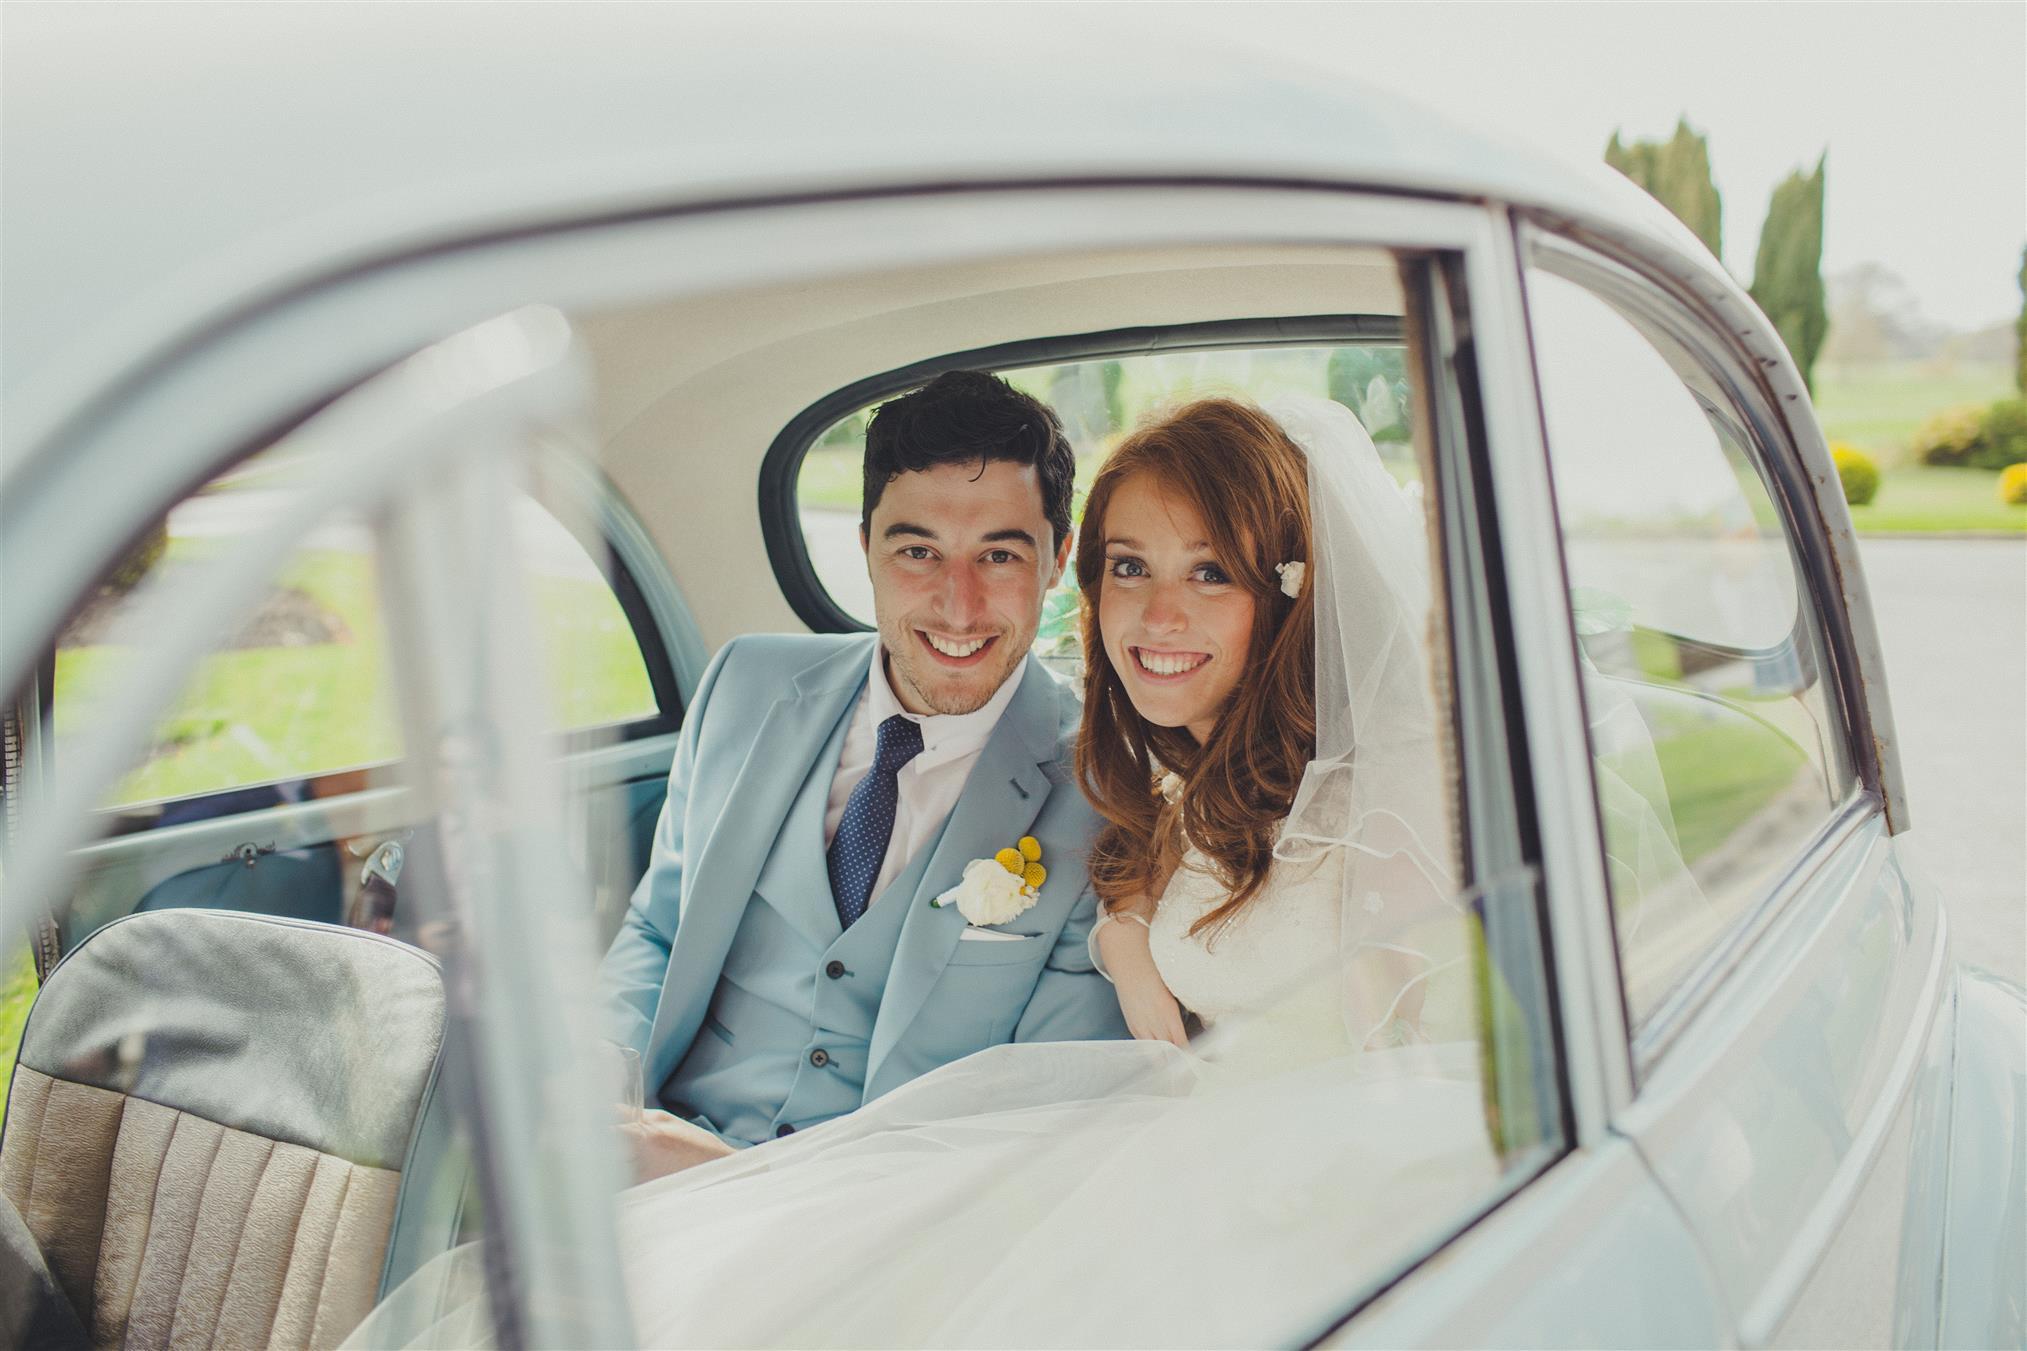 Bride & Groom - A Spring 1960s Inspired Wedding